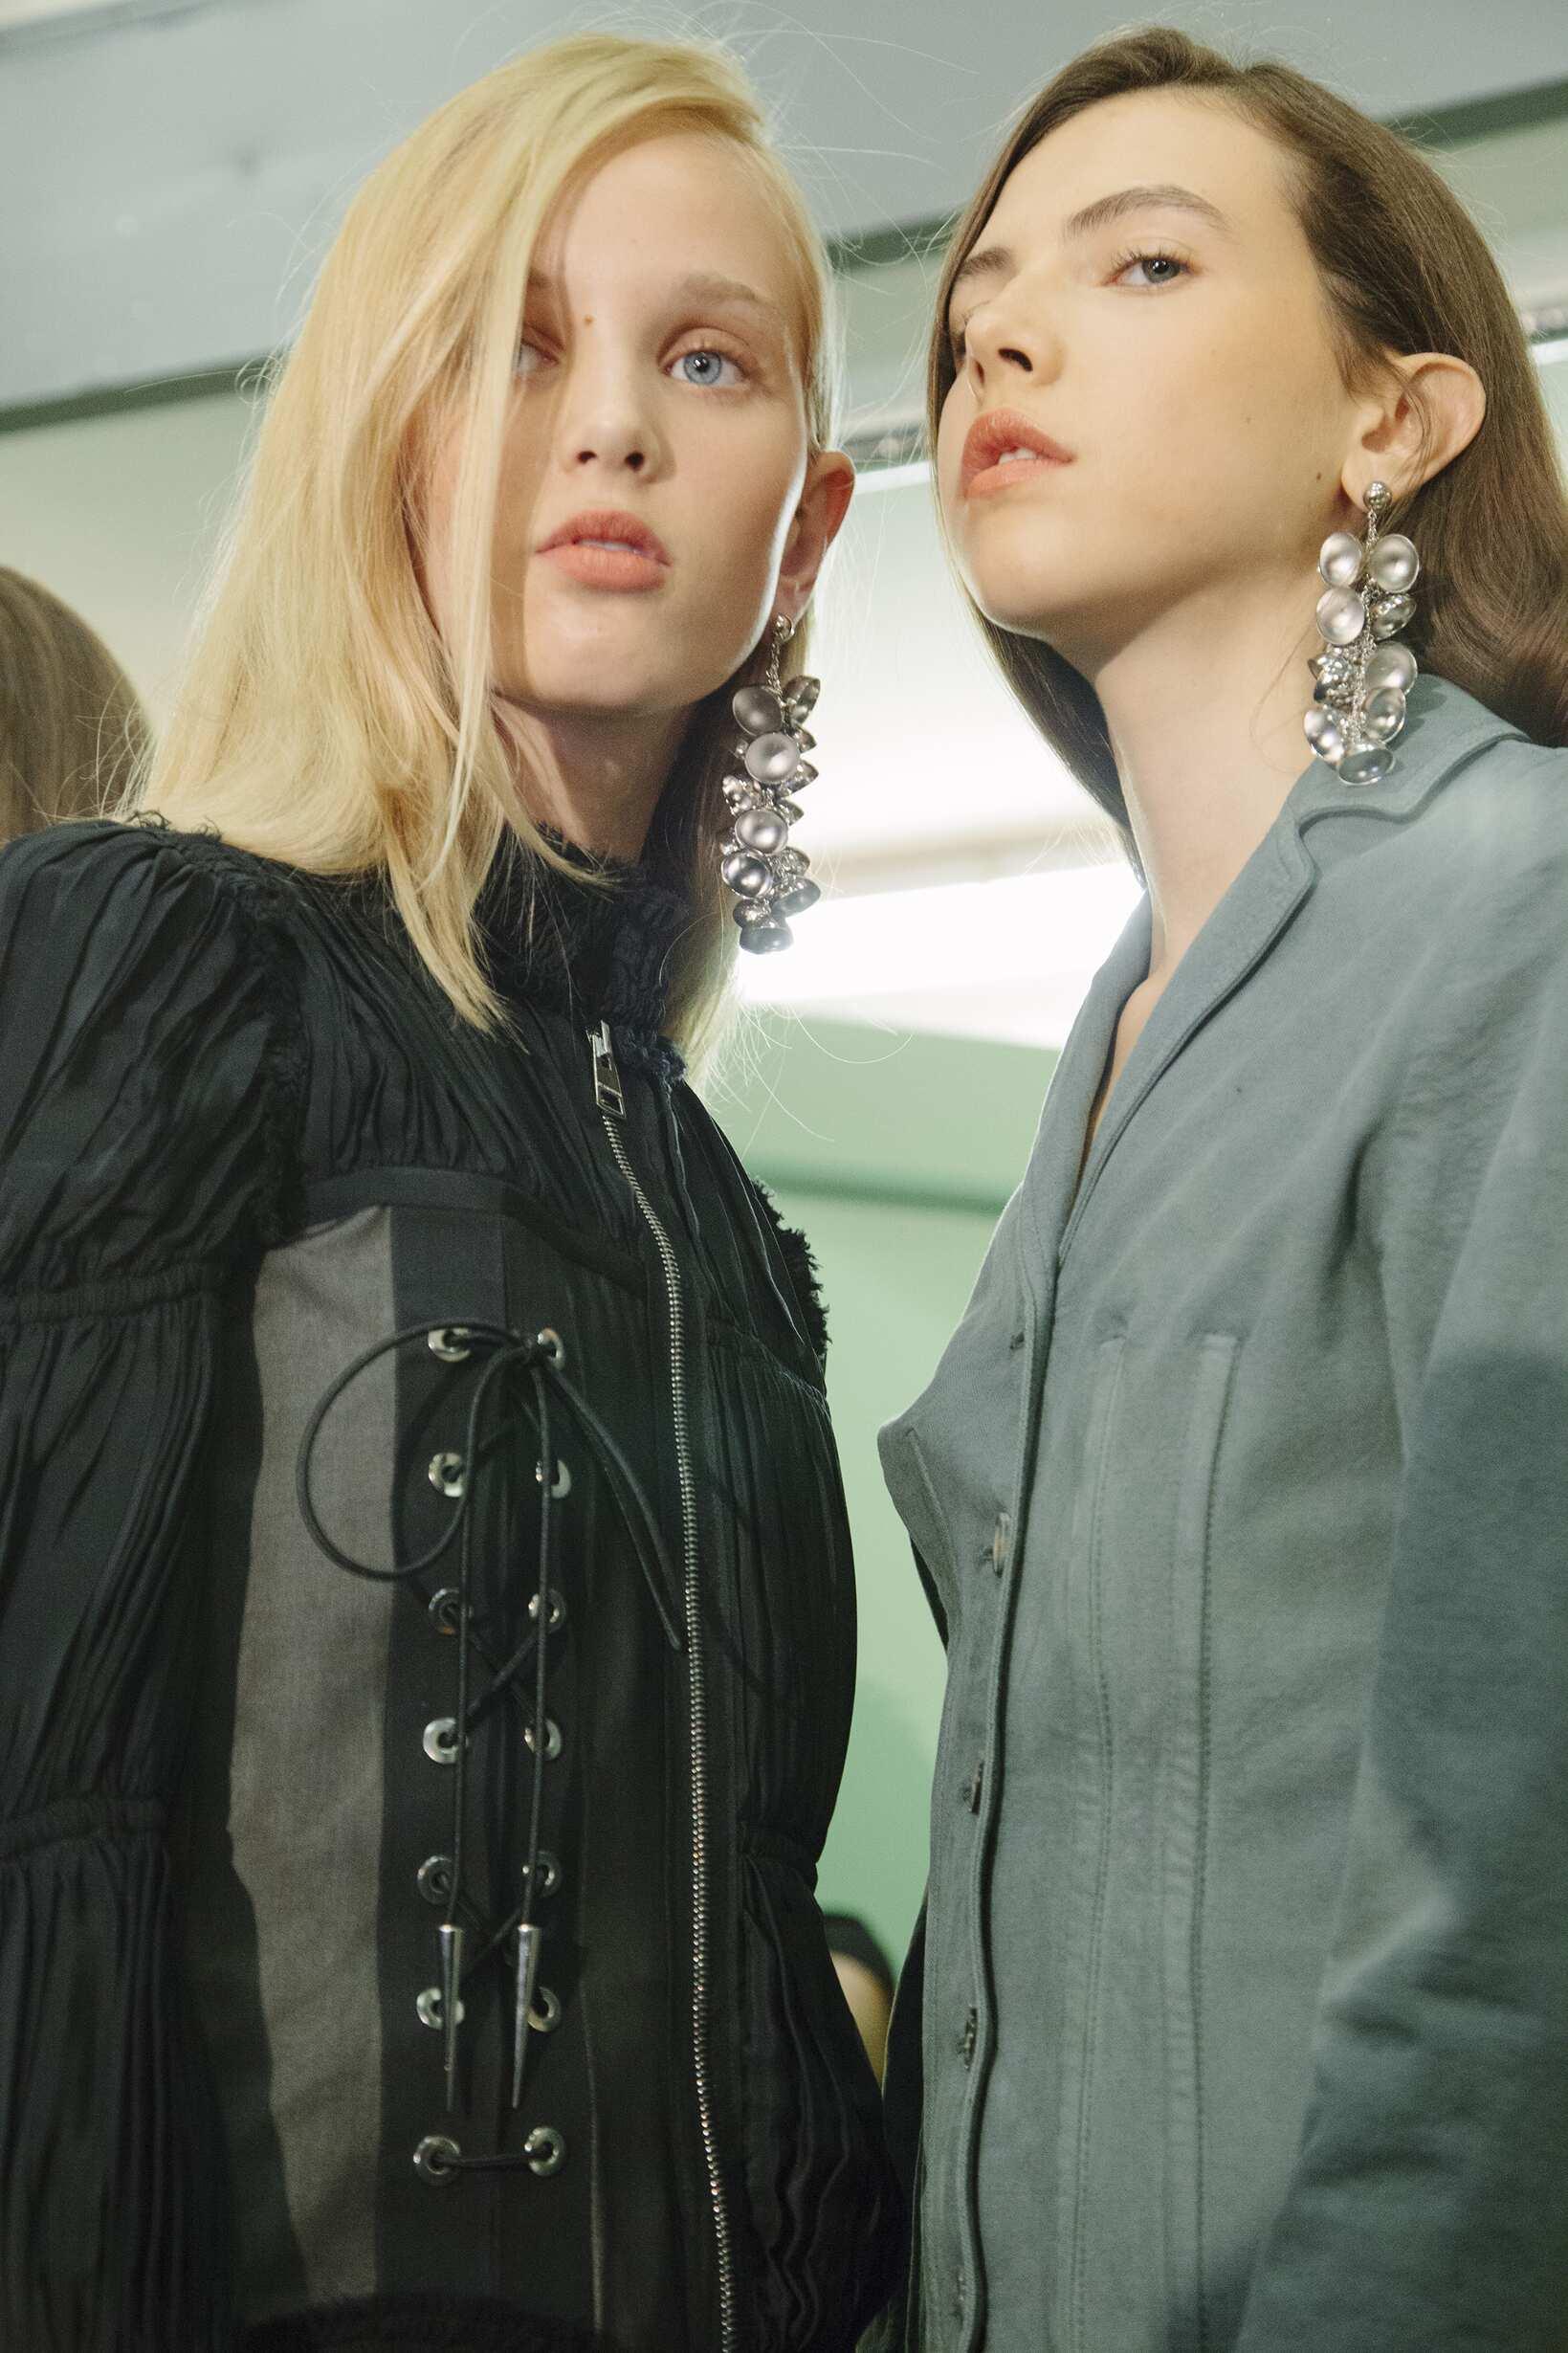 Backstage Woman J.W. Anderson Models